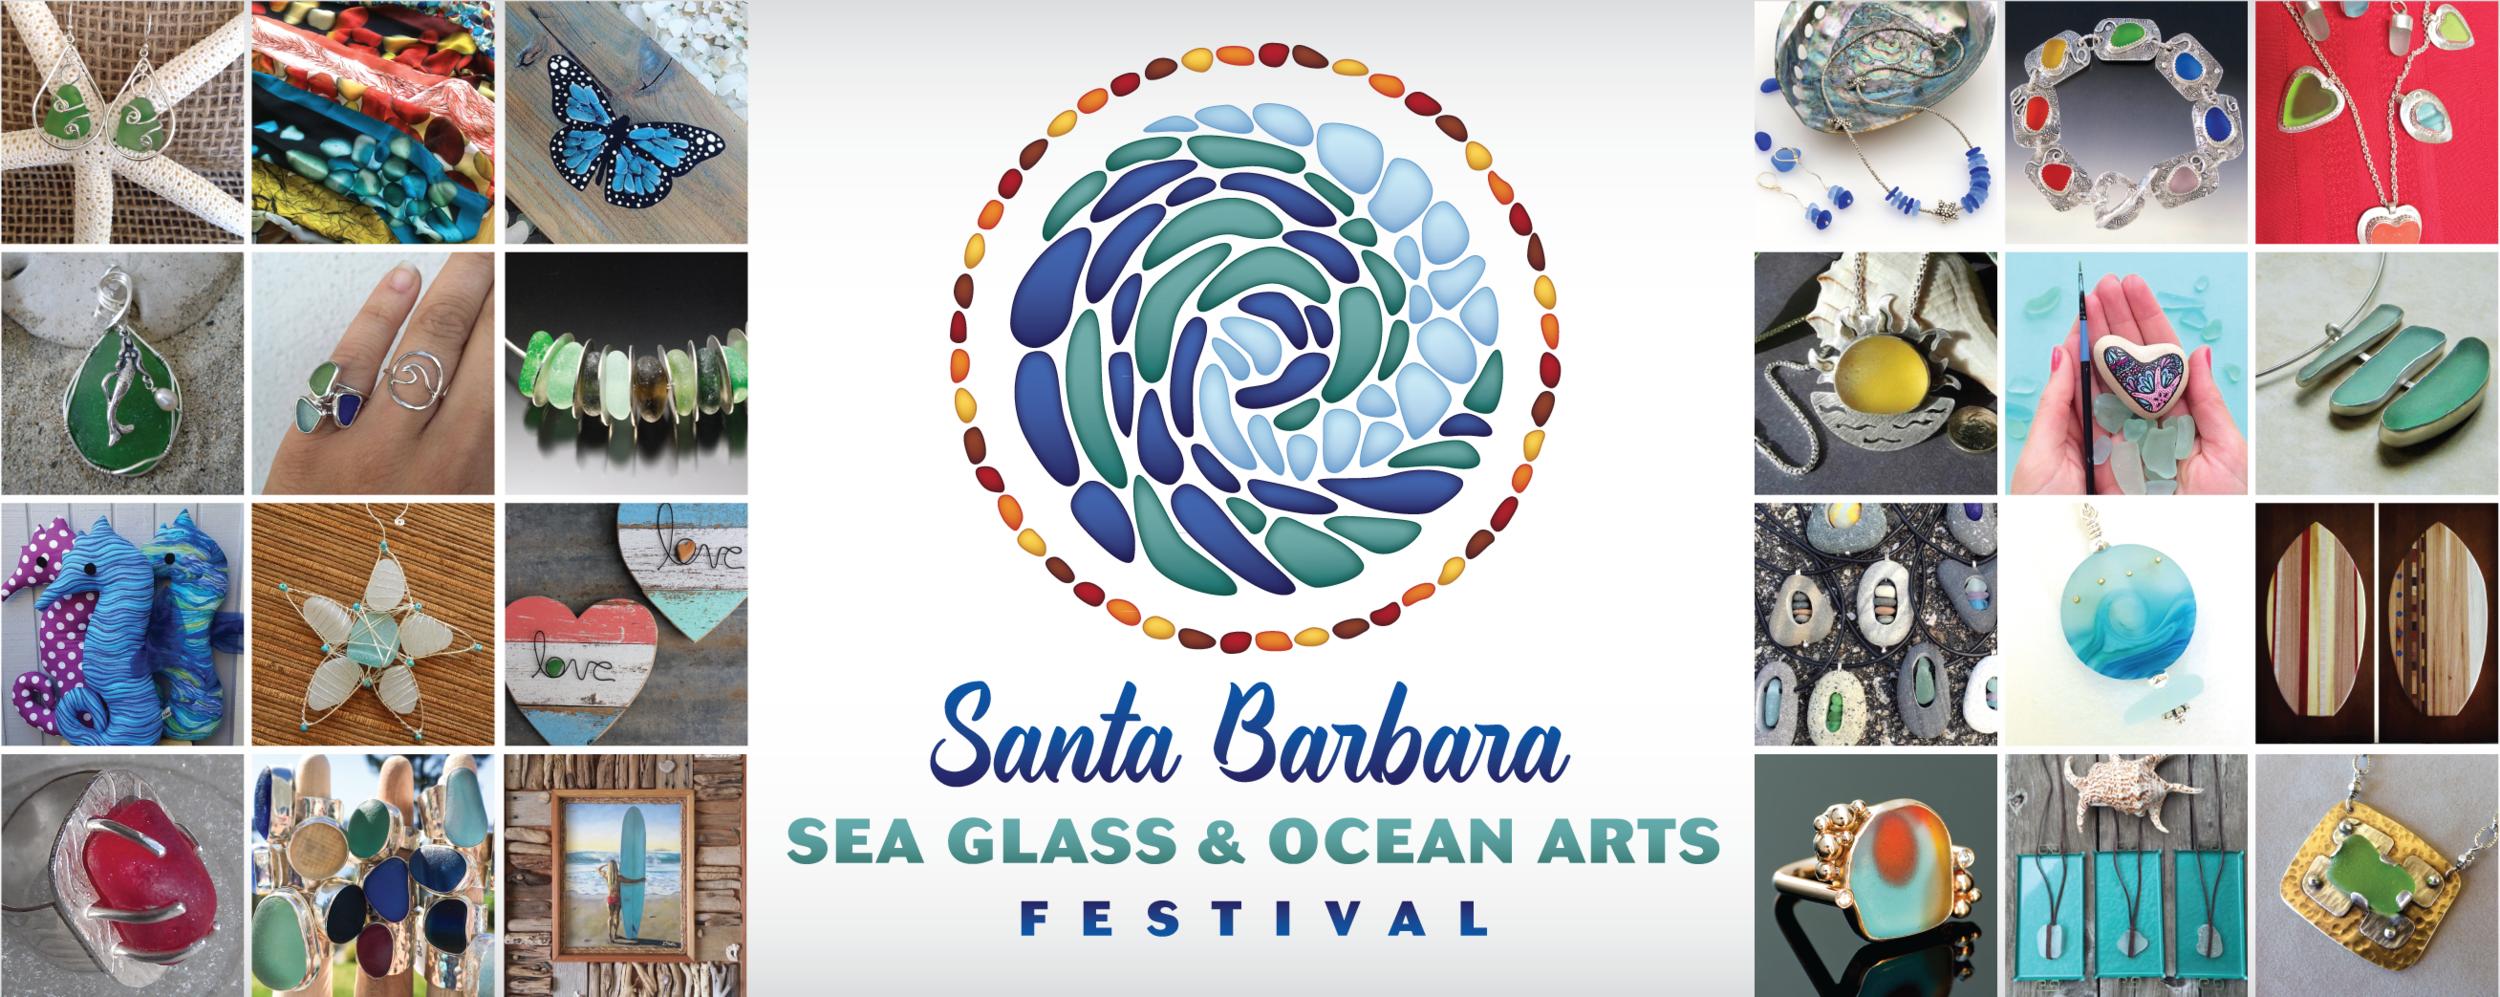 Social Media Cover Image for the Santa Barbara Sea Glass & Ocean Arts Festival